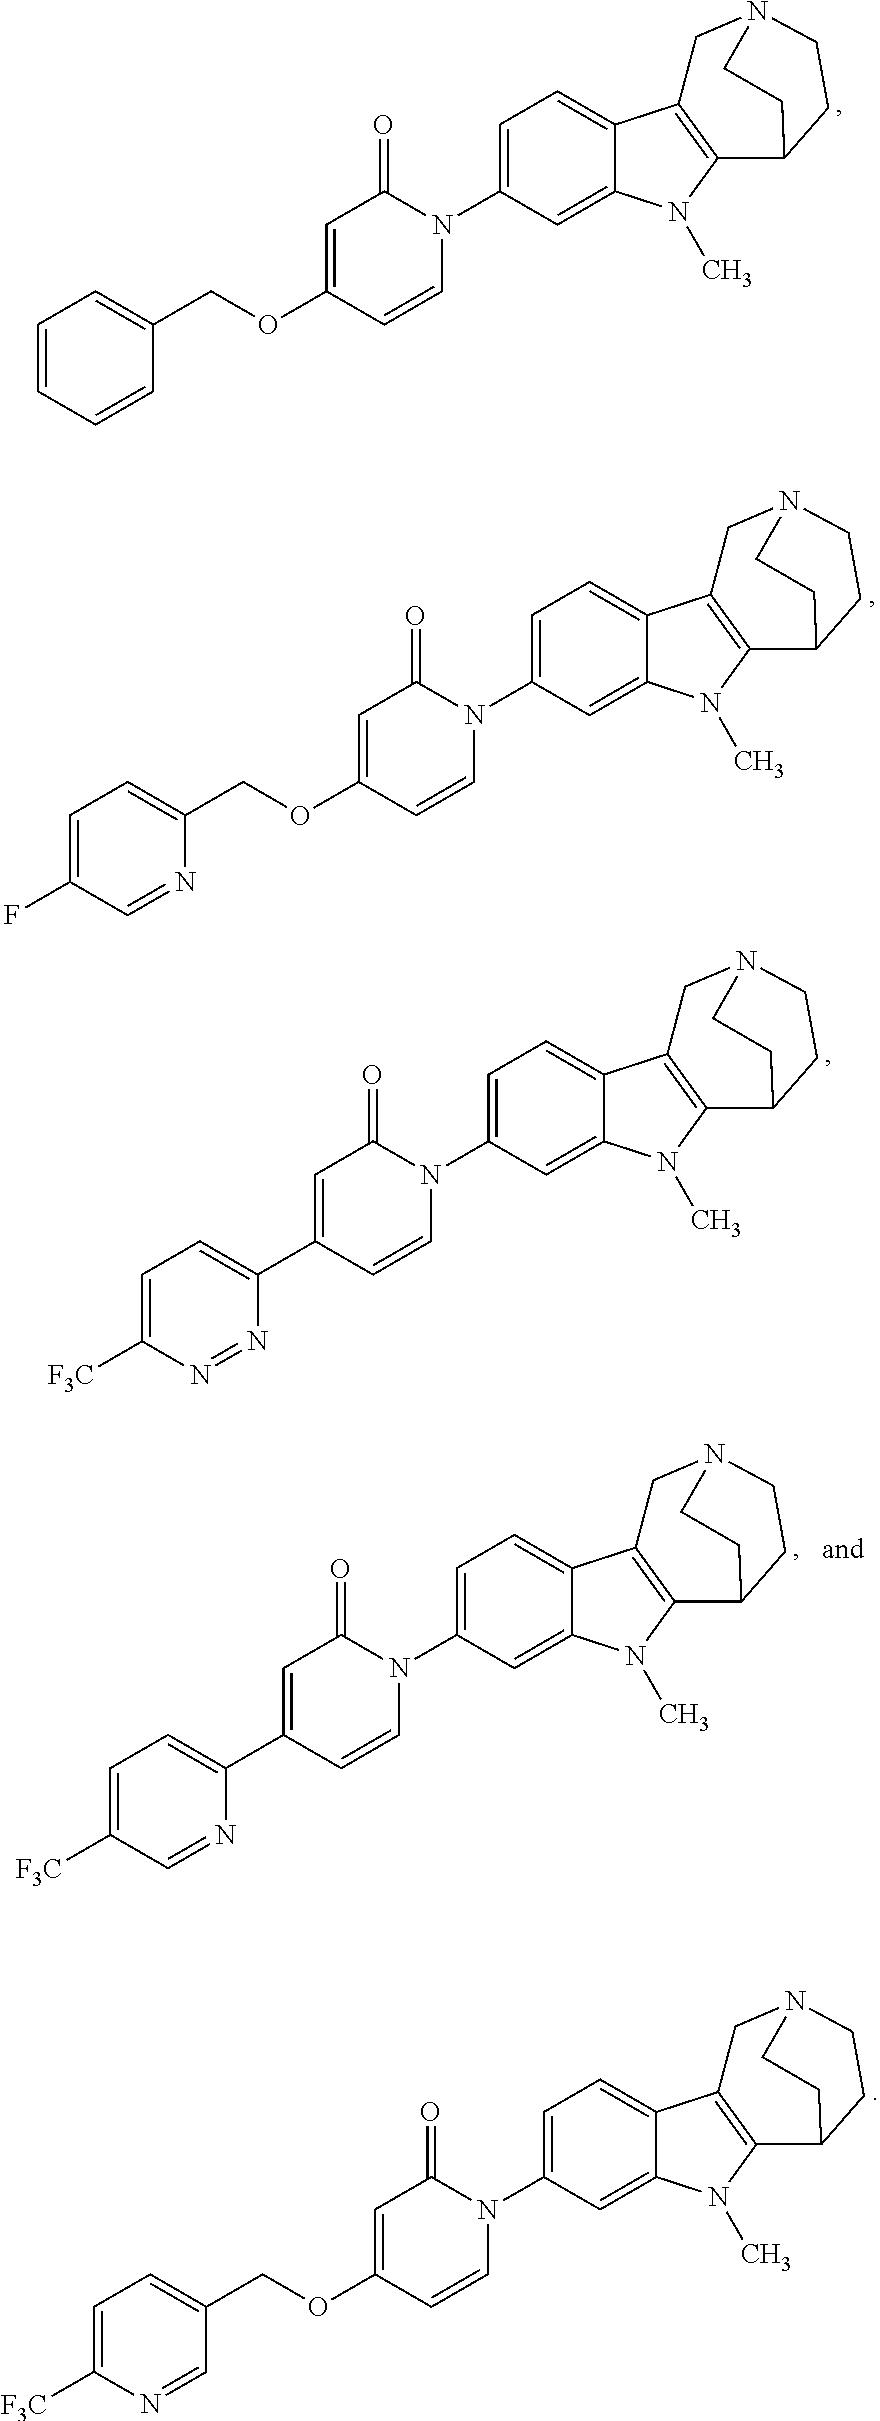 us9073925b2 azinone substituted azabicycloalkane indole and Ortho Tech Salary figure us09073925 20150707 c00076